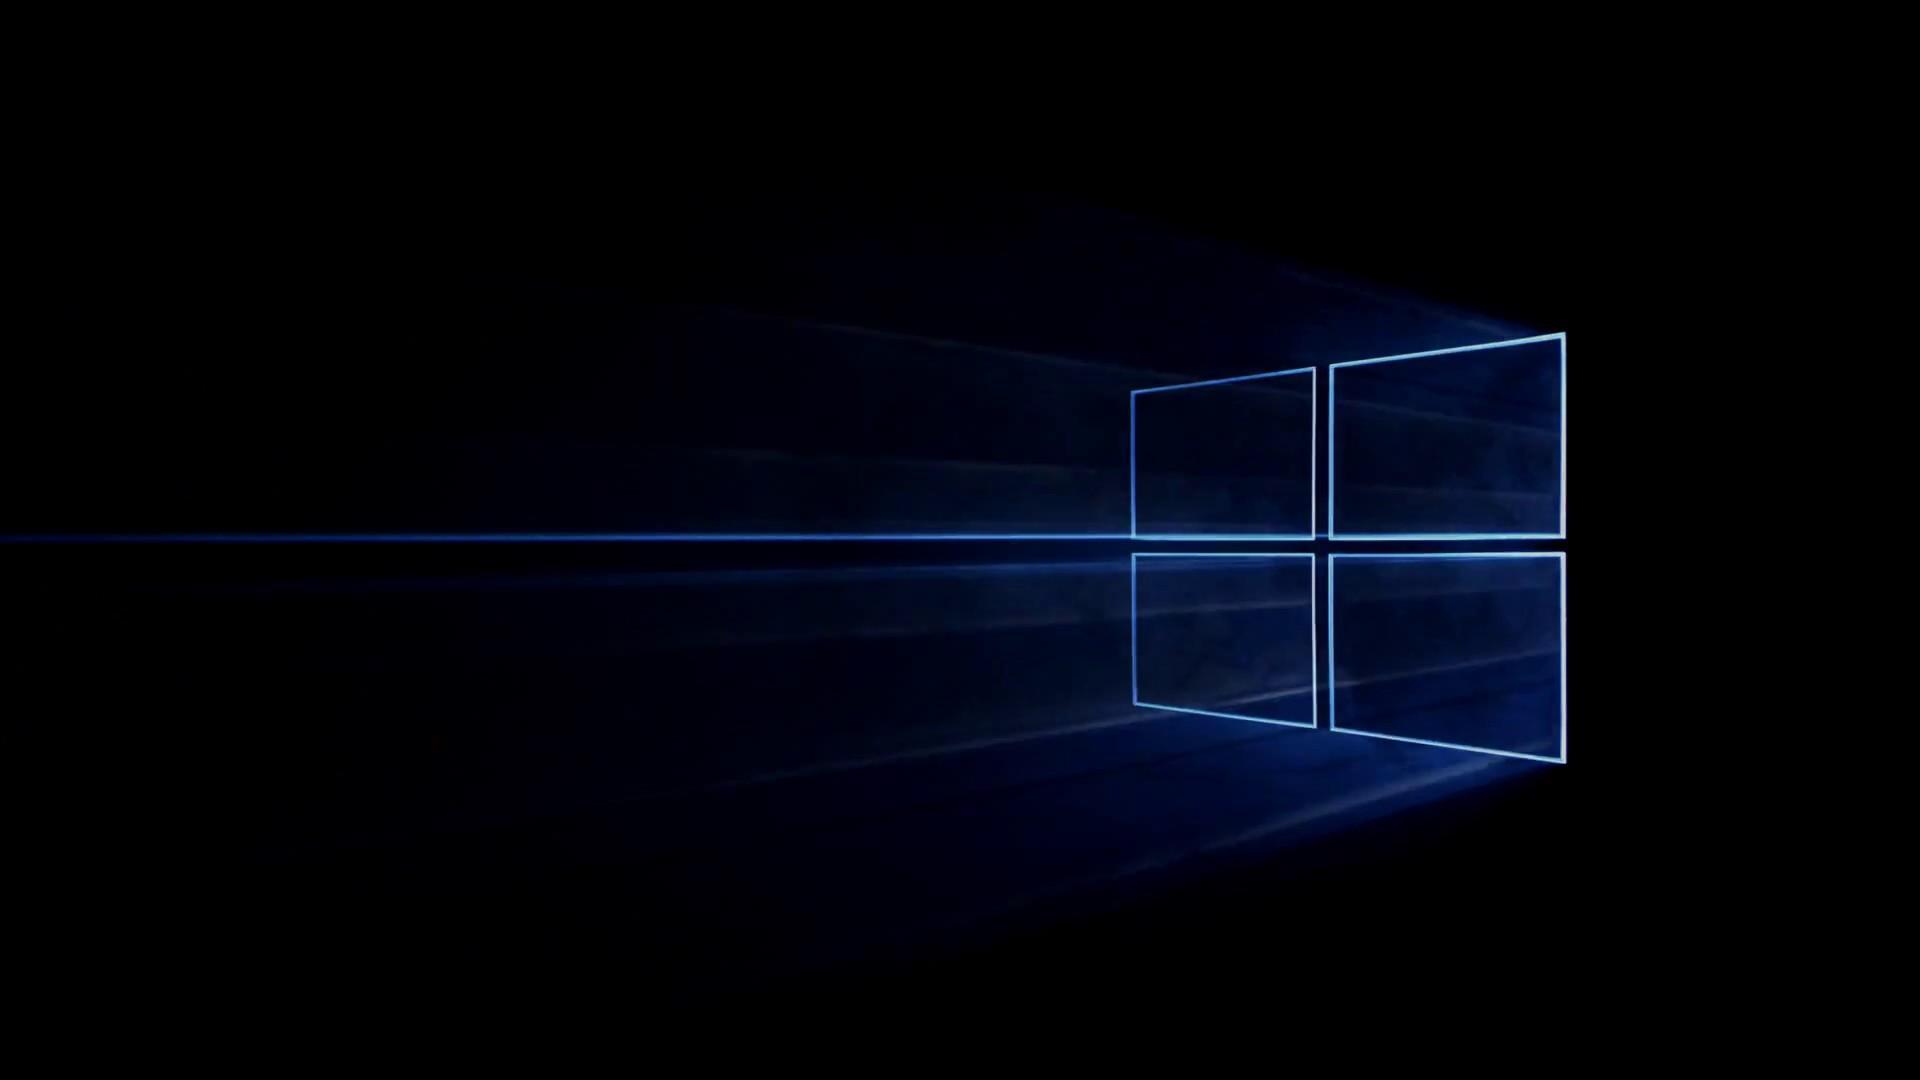 Windows 10 Wallpaper ao Domingo   FCincias 1920x1080